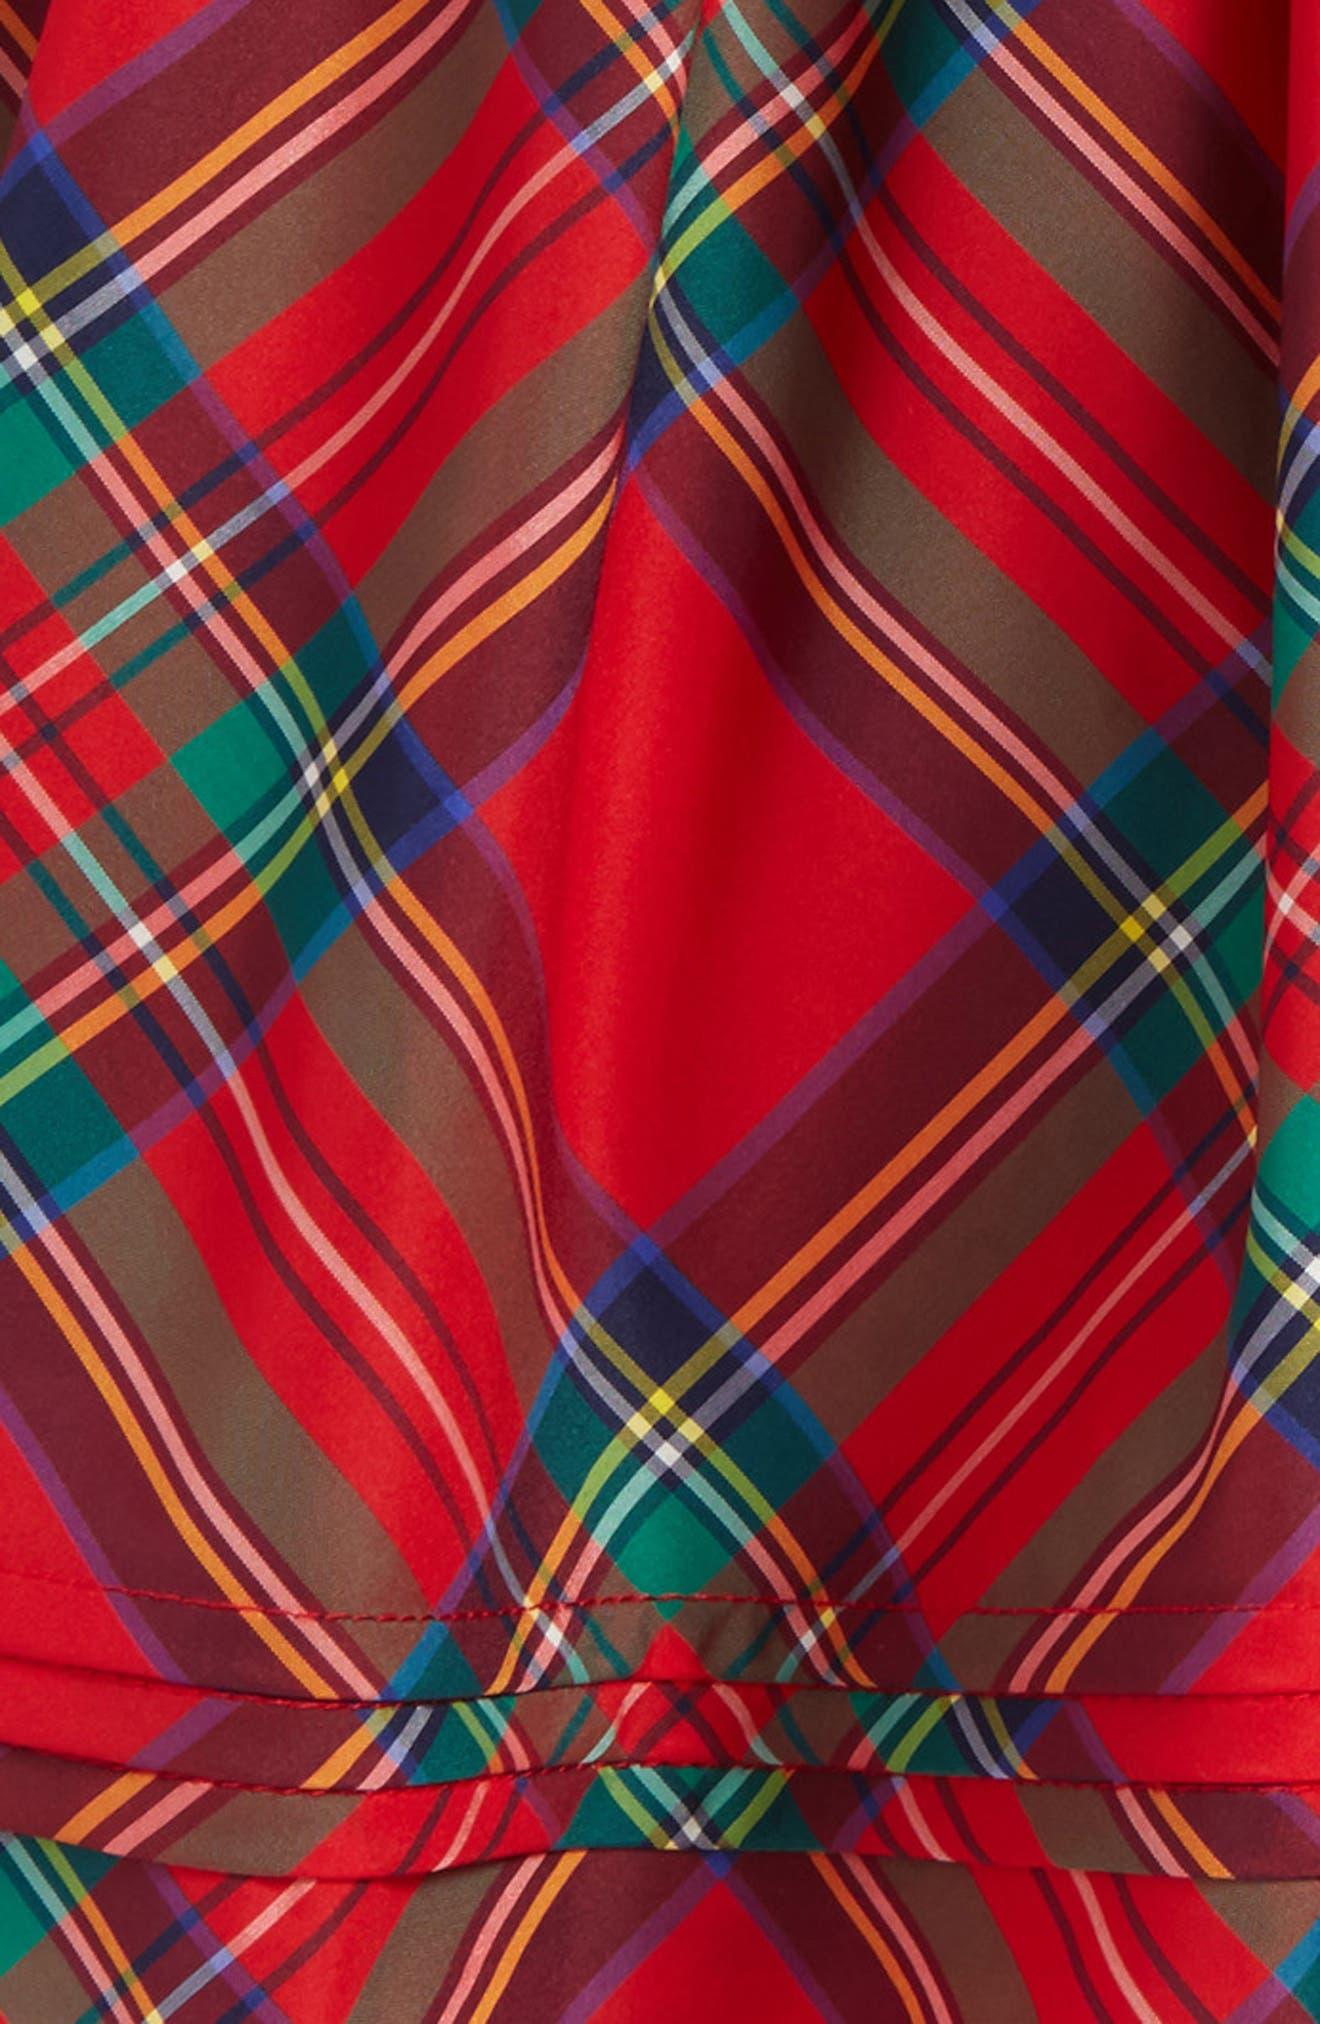 Jolly Plaid Party Skirt,                             Alternate thumbnail 2, color,                             634